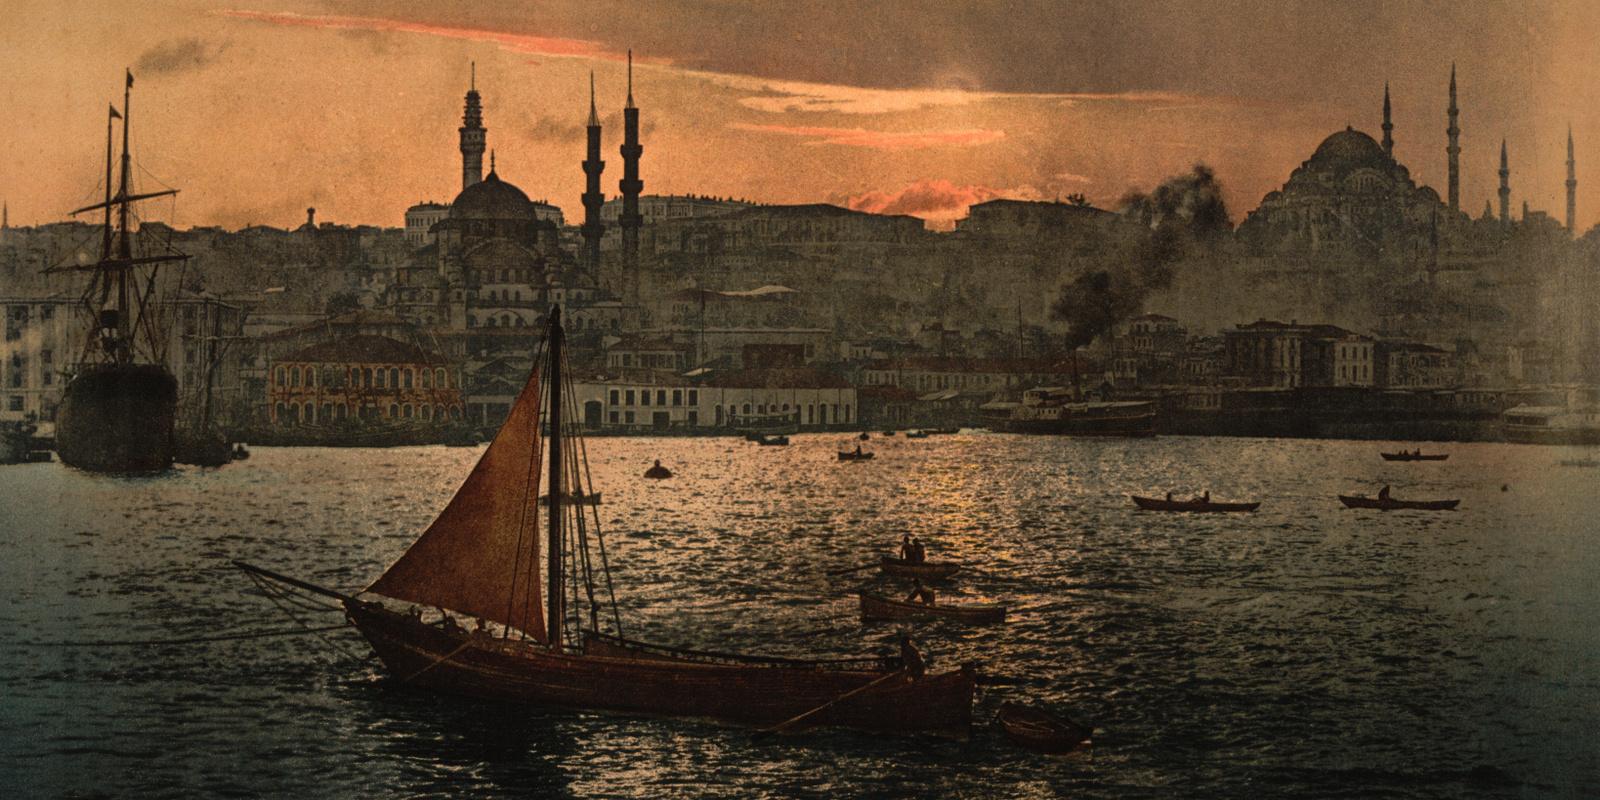 Cultural Policy and Branding in Turkey   Aslı Iğsız